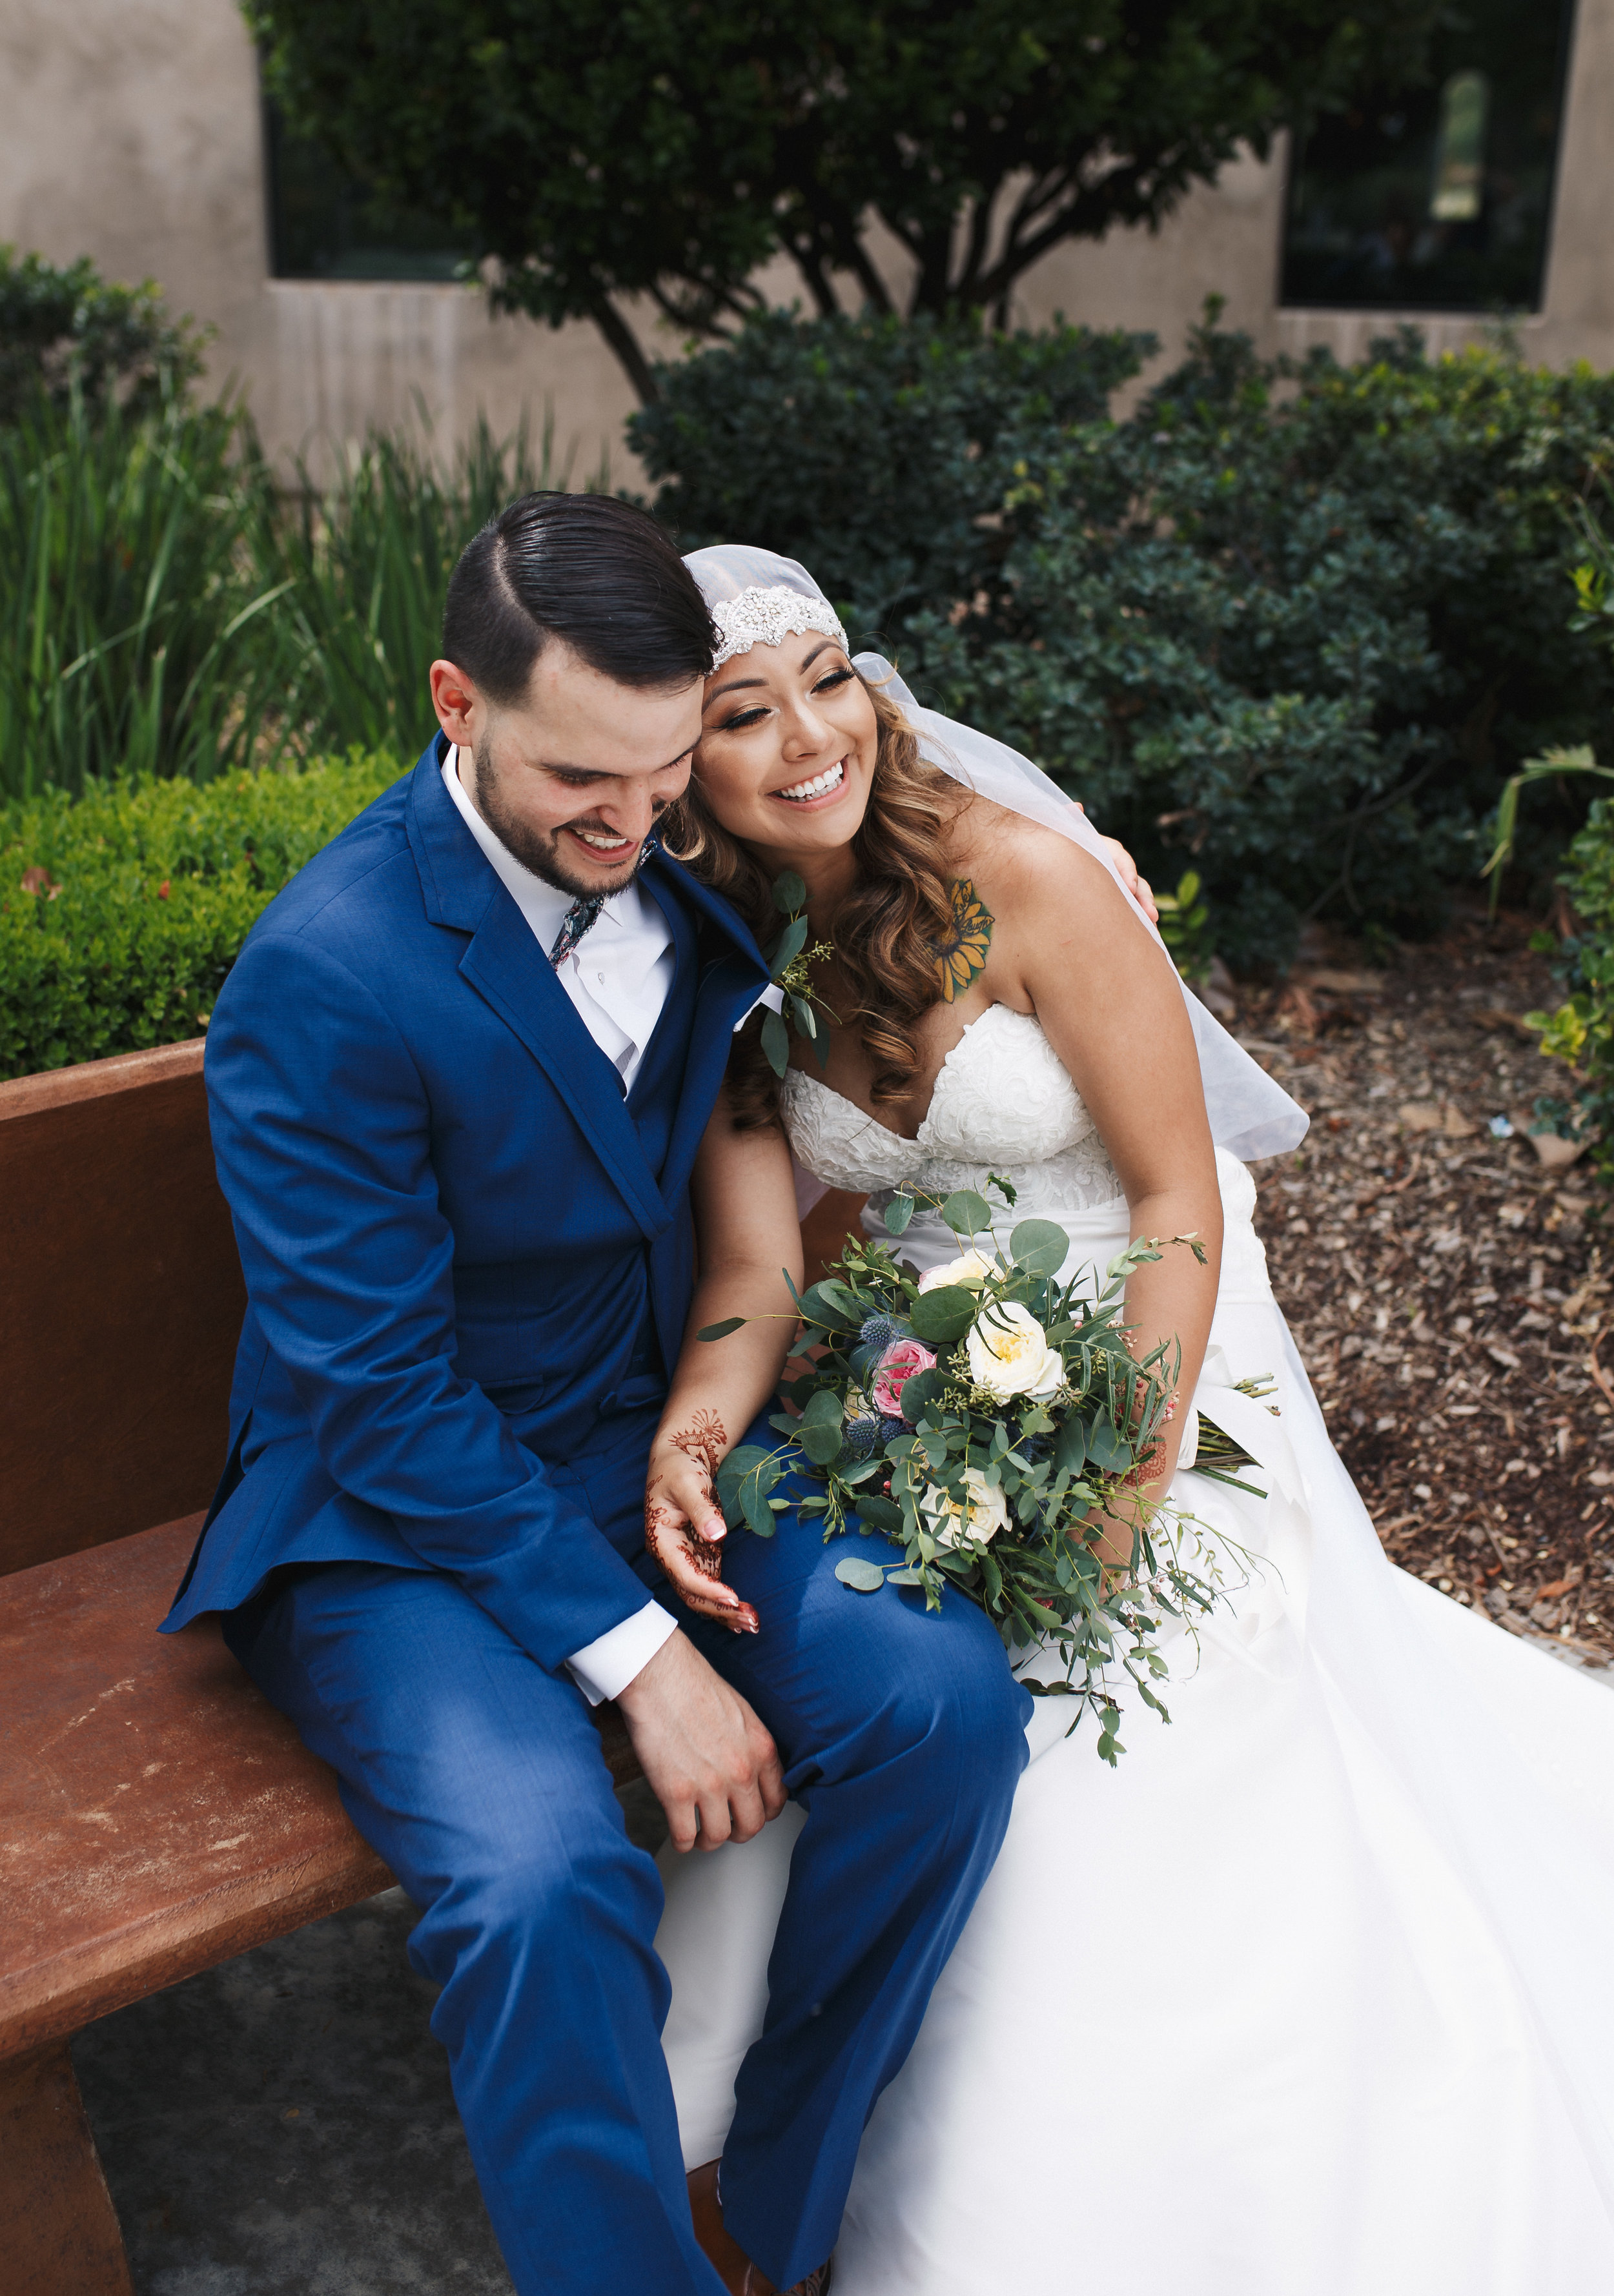 Veronica & Adrian Wedding 32 (1 of 1).jpg